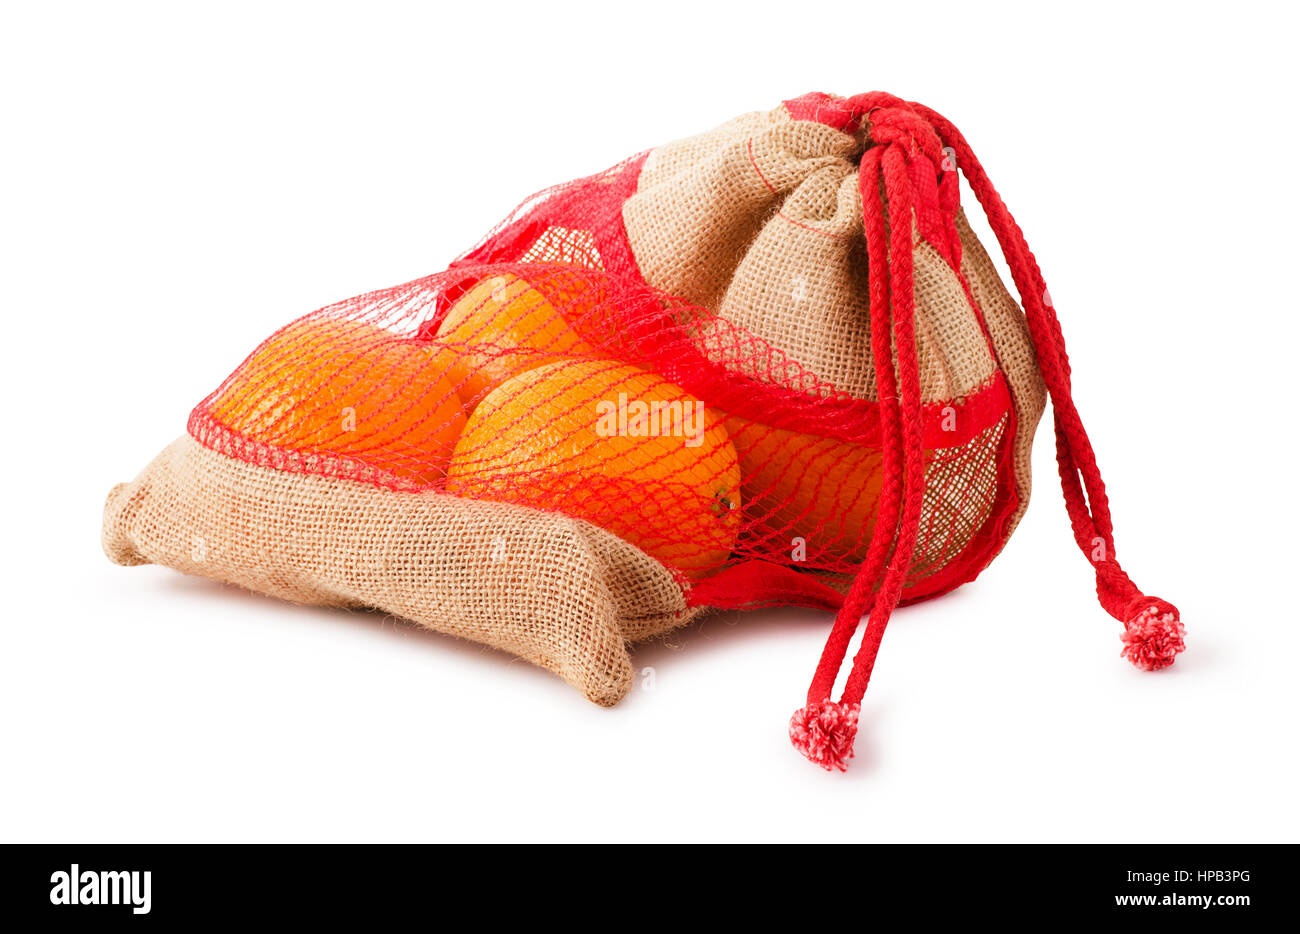 Fresh oranges in plastic canvas mesh sack isolated on white background - Stock Image